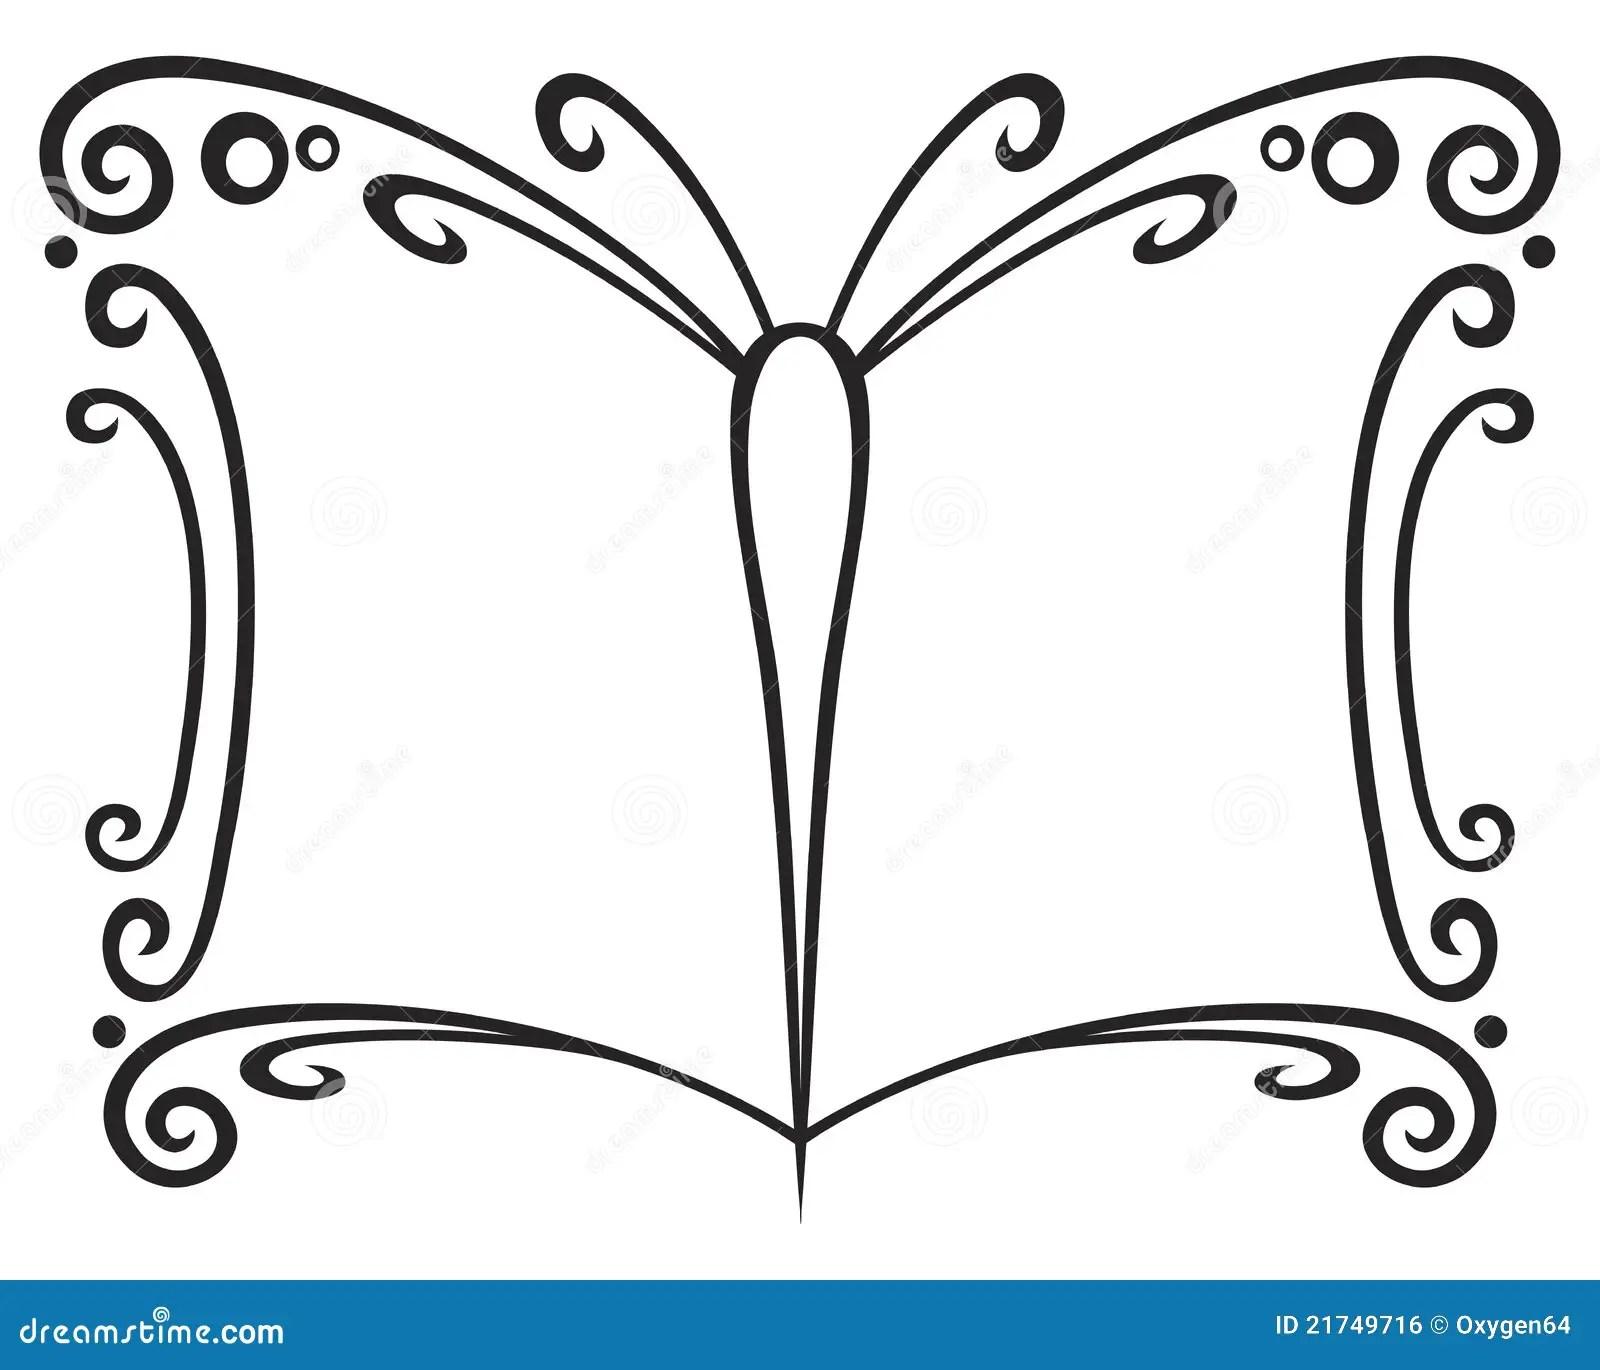 Book Symbol Royalty Free Stock Image